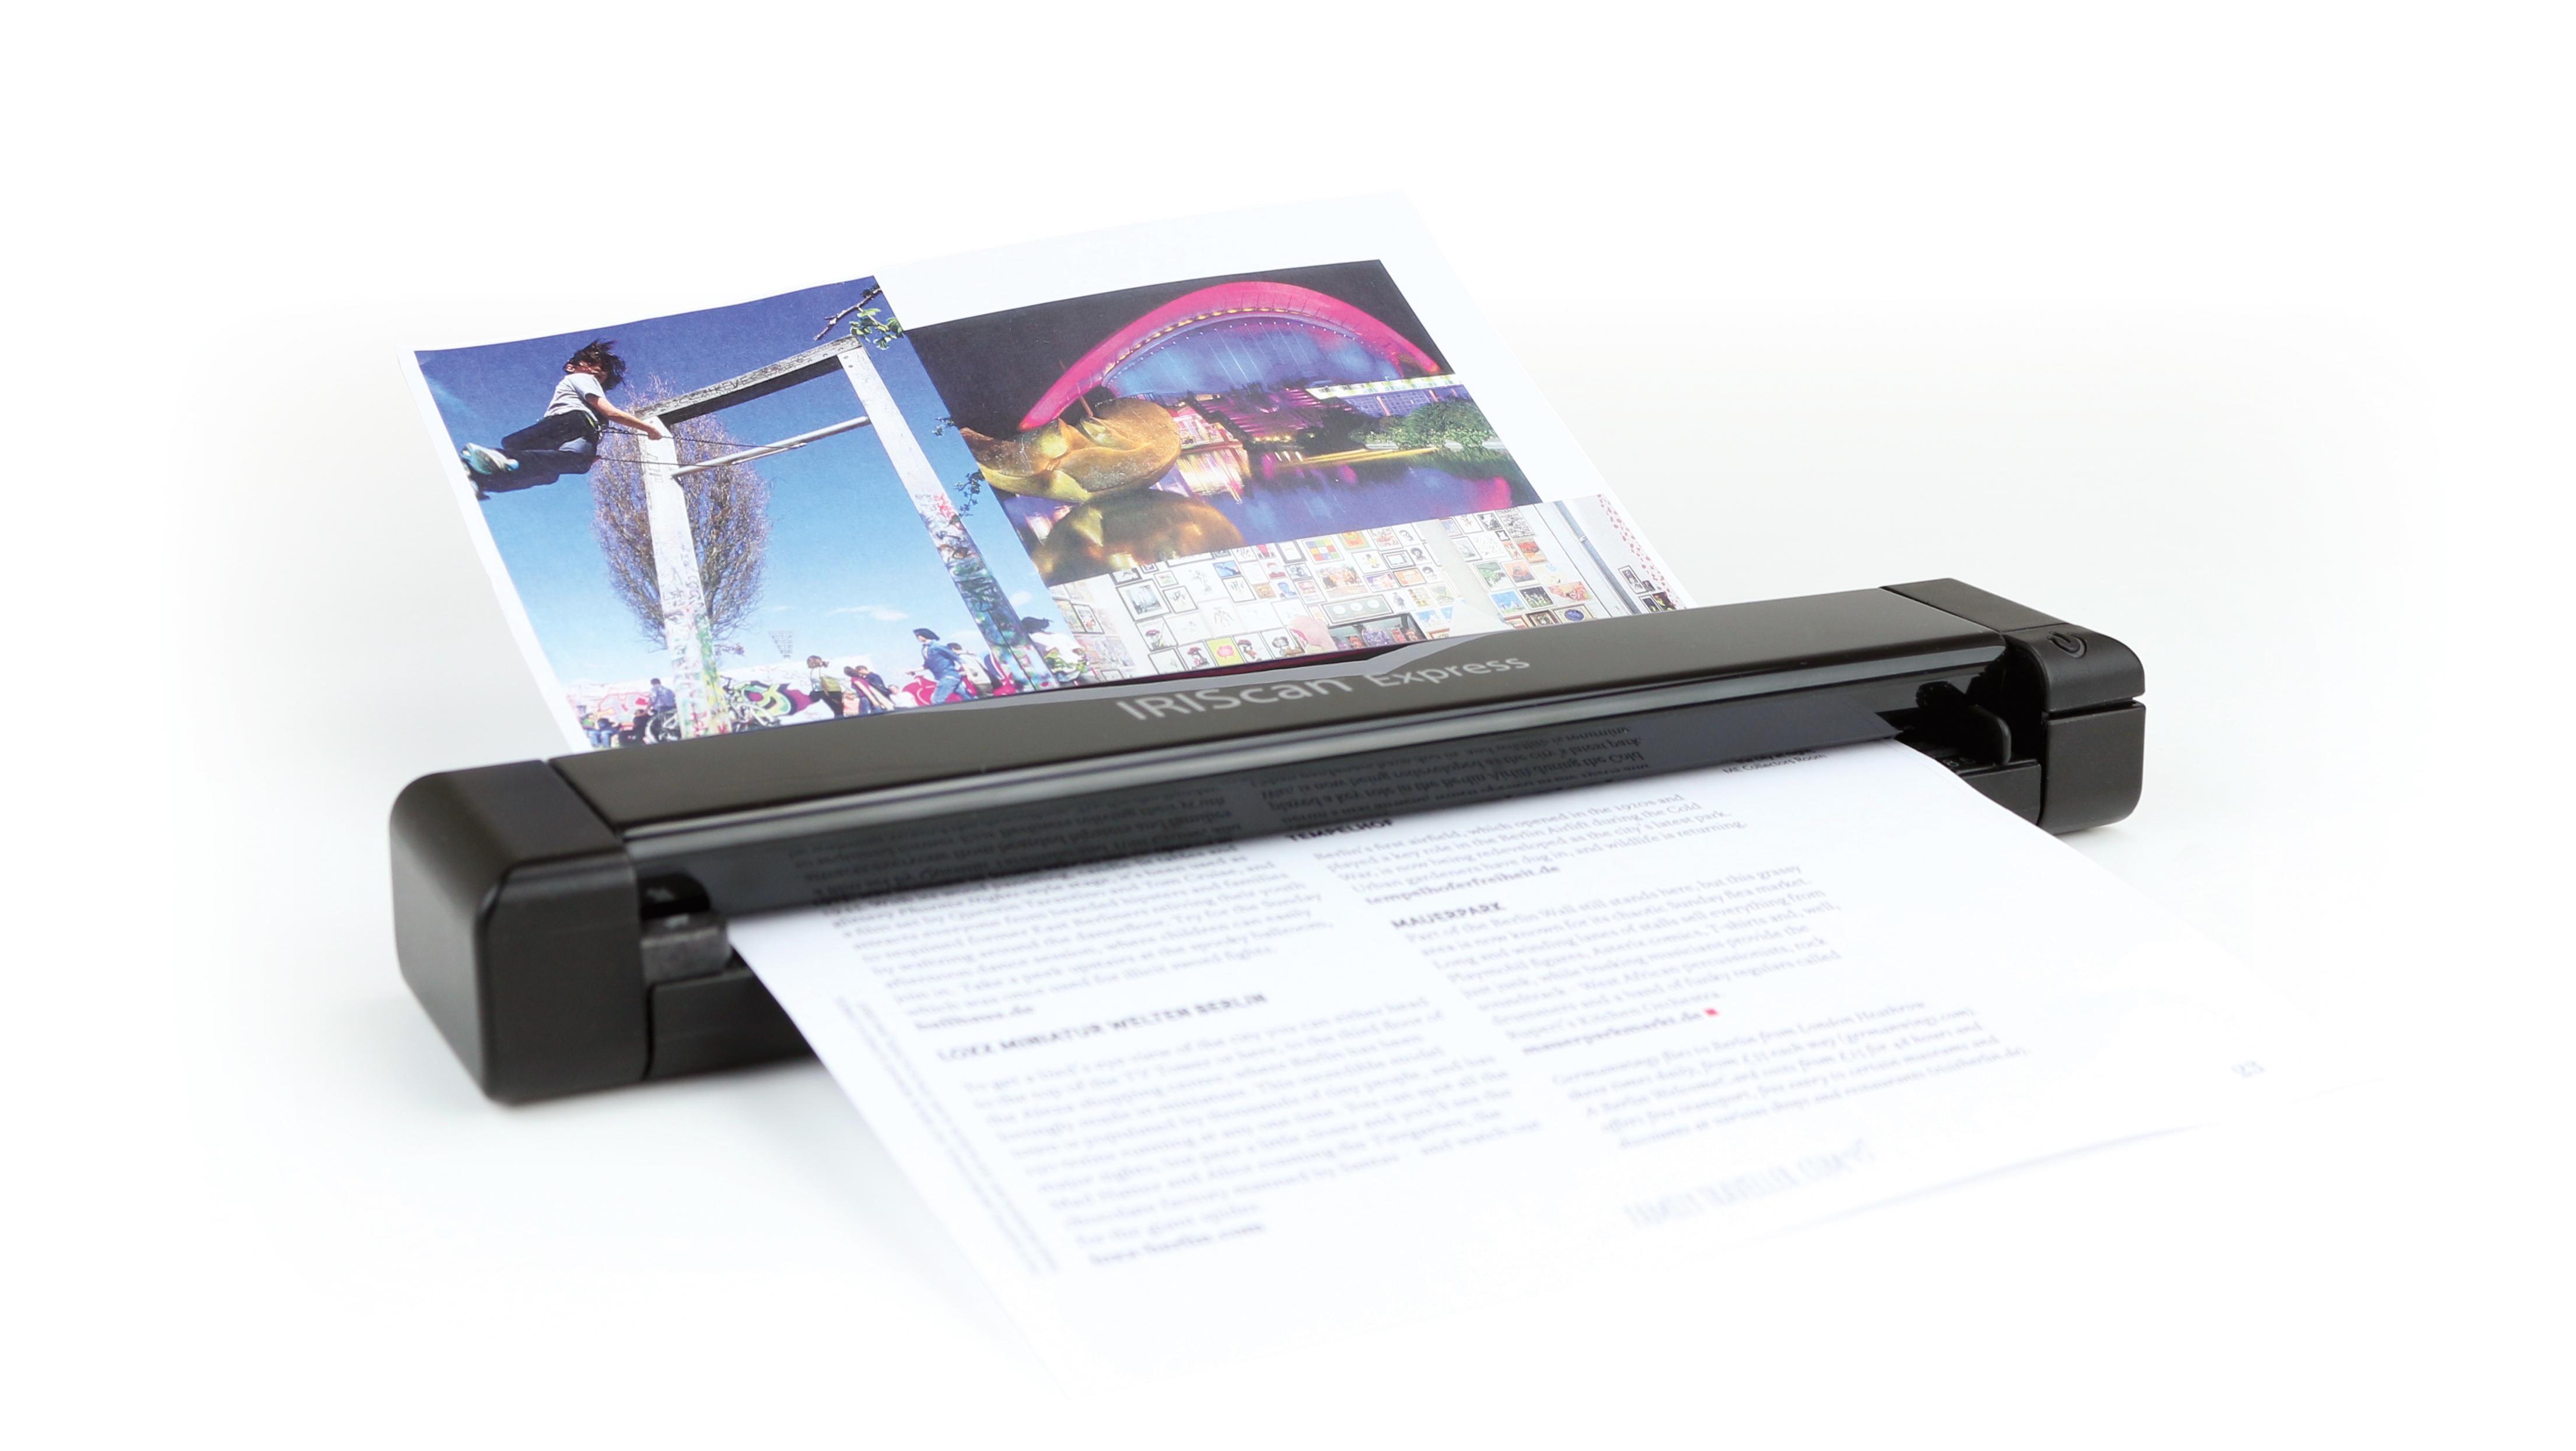 IRIS IRIScan Express 4 - Einzelblatt-Scanner - 216 x 297 mm